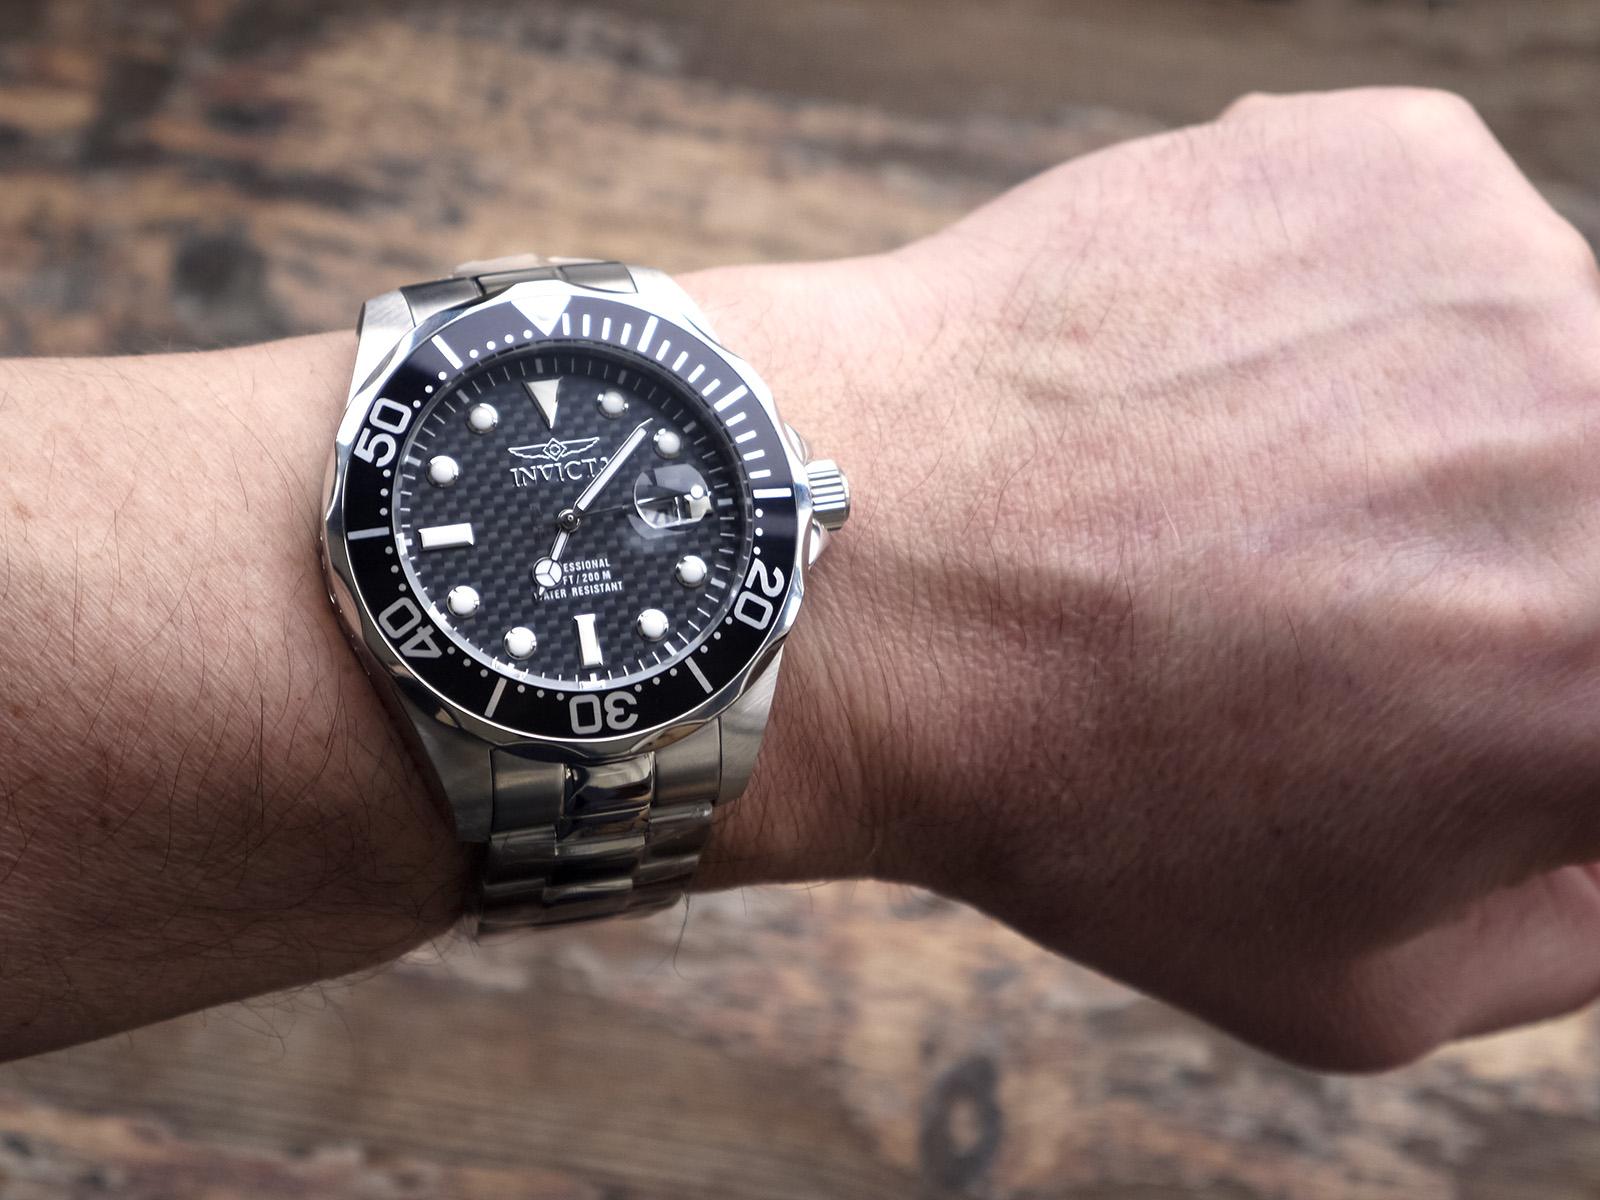 Invicta 12562 Pro Diver Black Carbon Fiber Dial Stainless